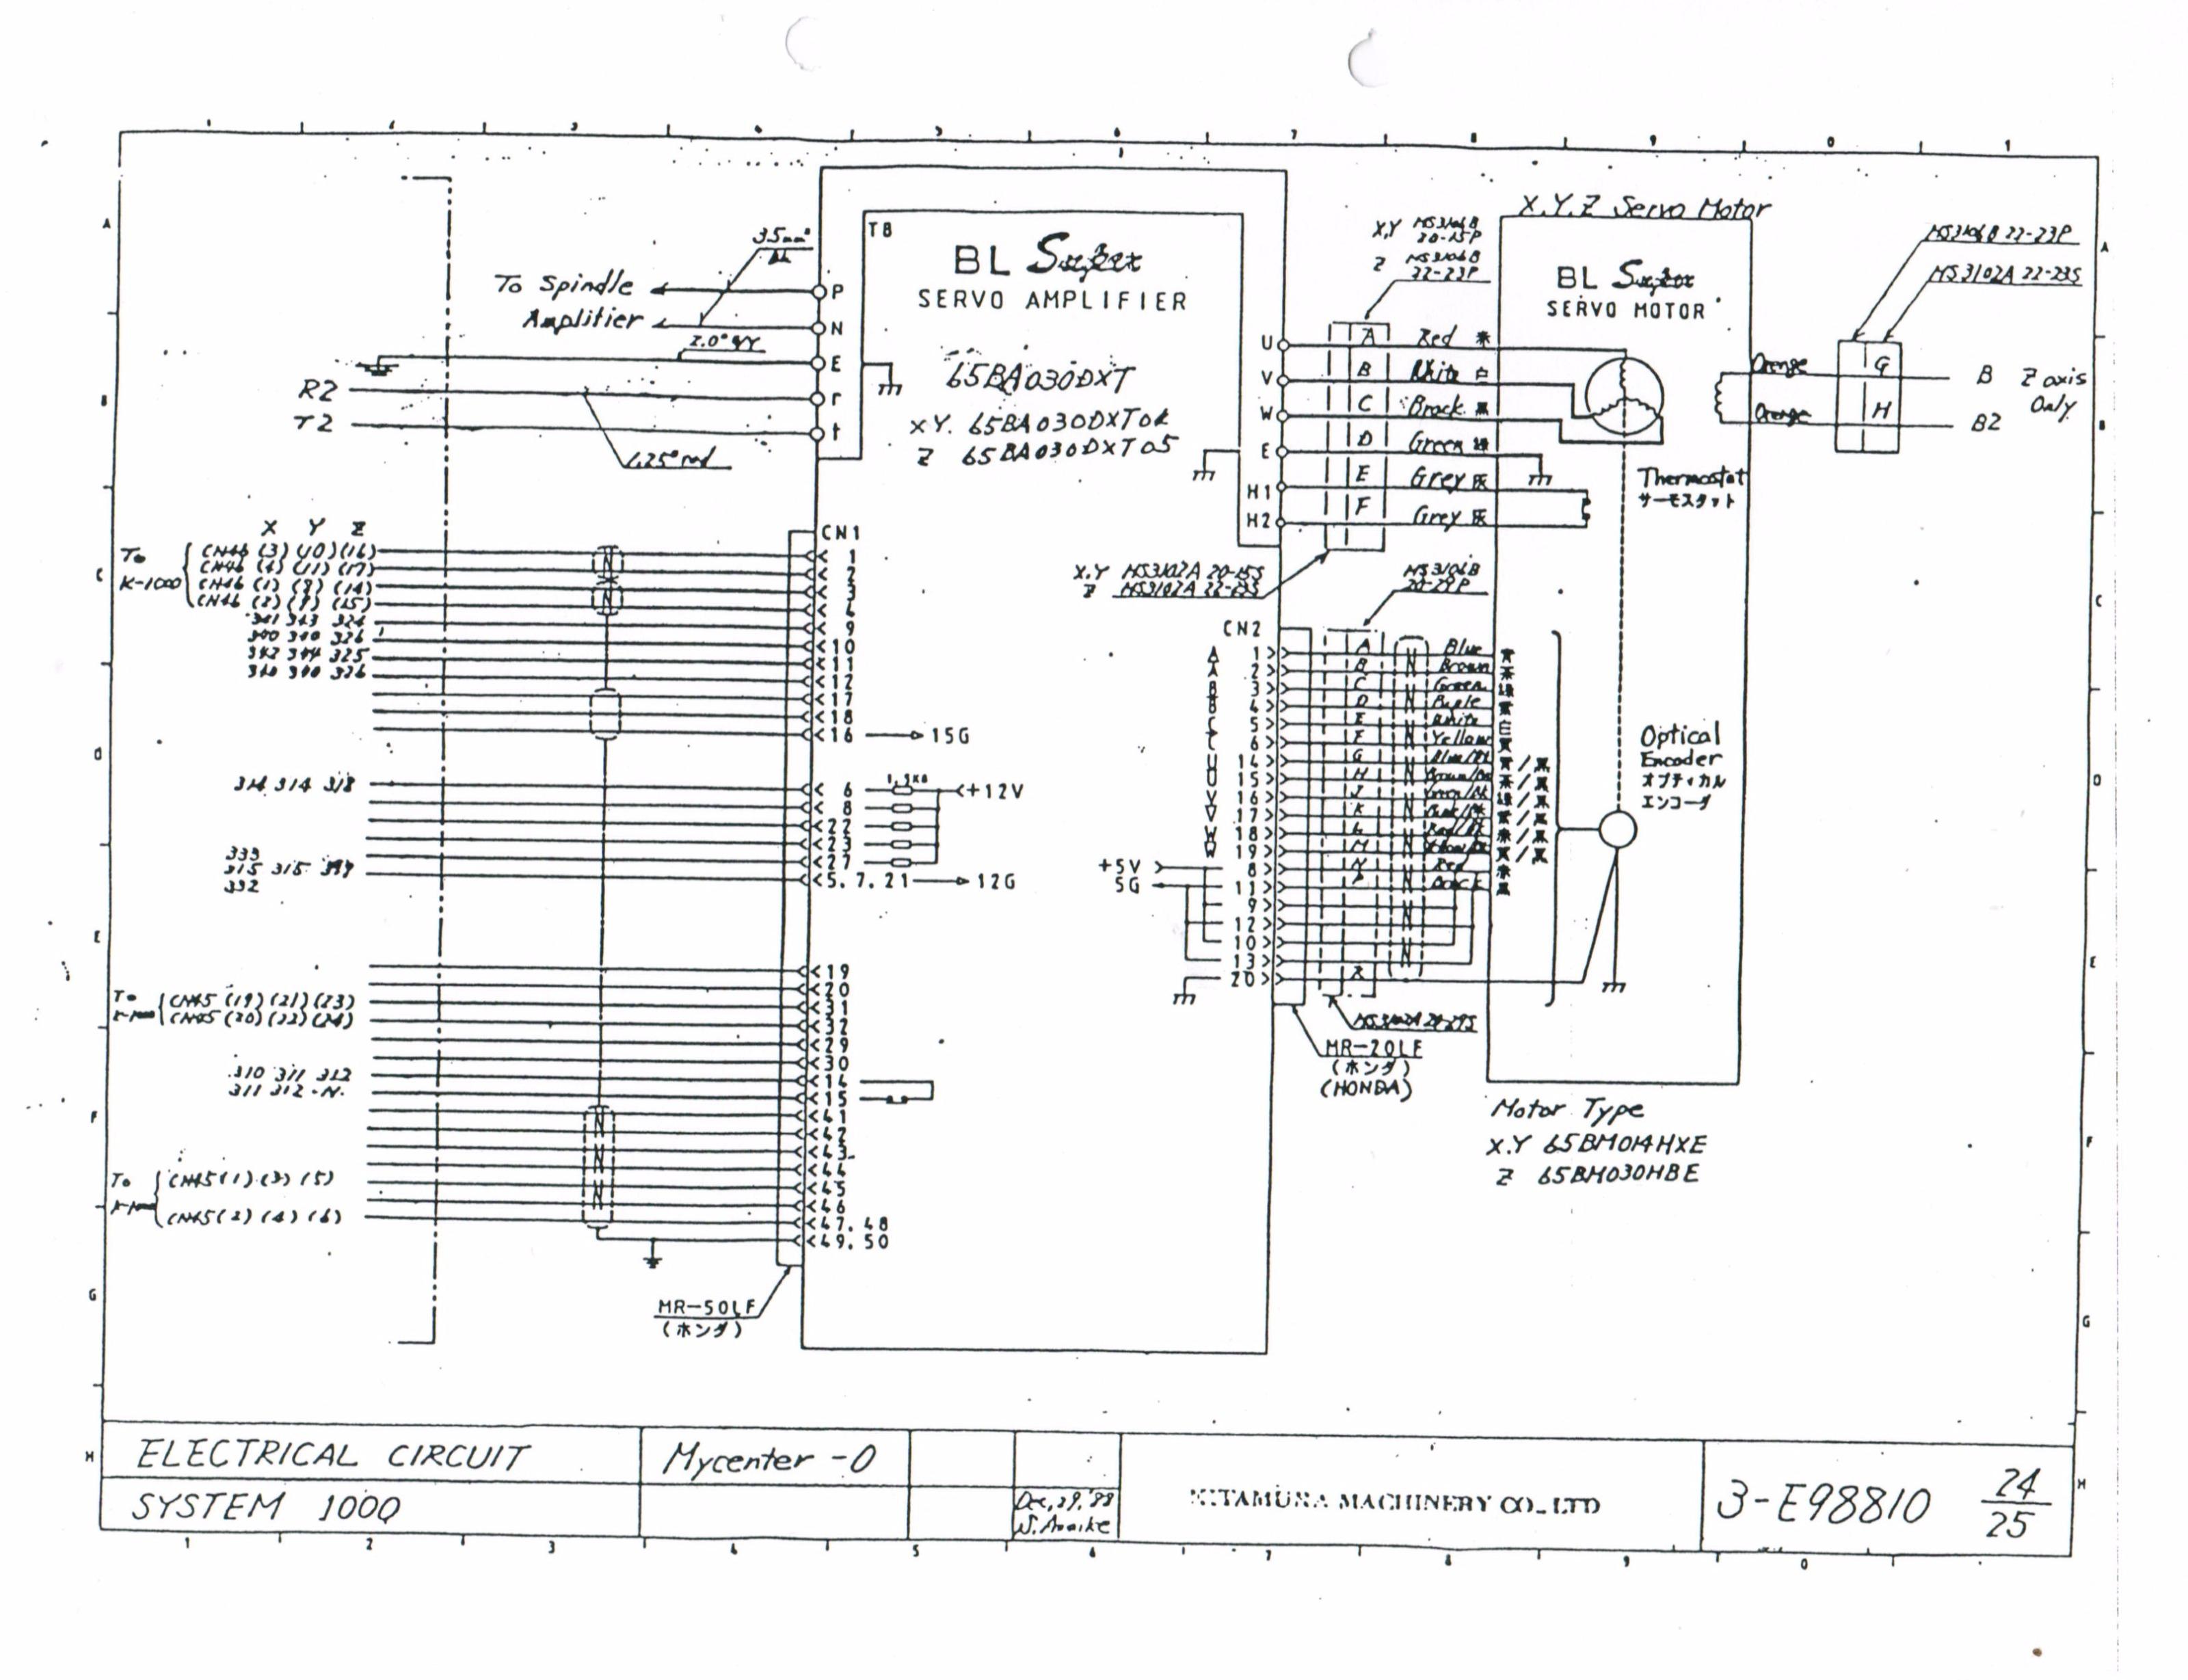 Cnc Rattm Wiring Diagram CNC Mill Diagram Wiring Diagram